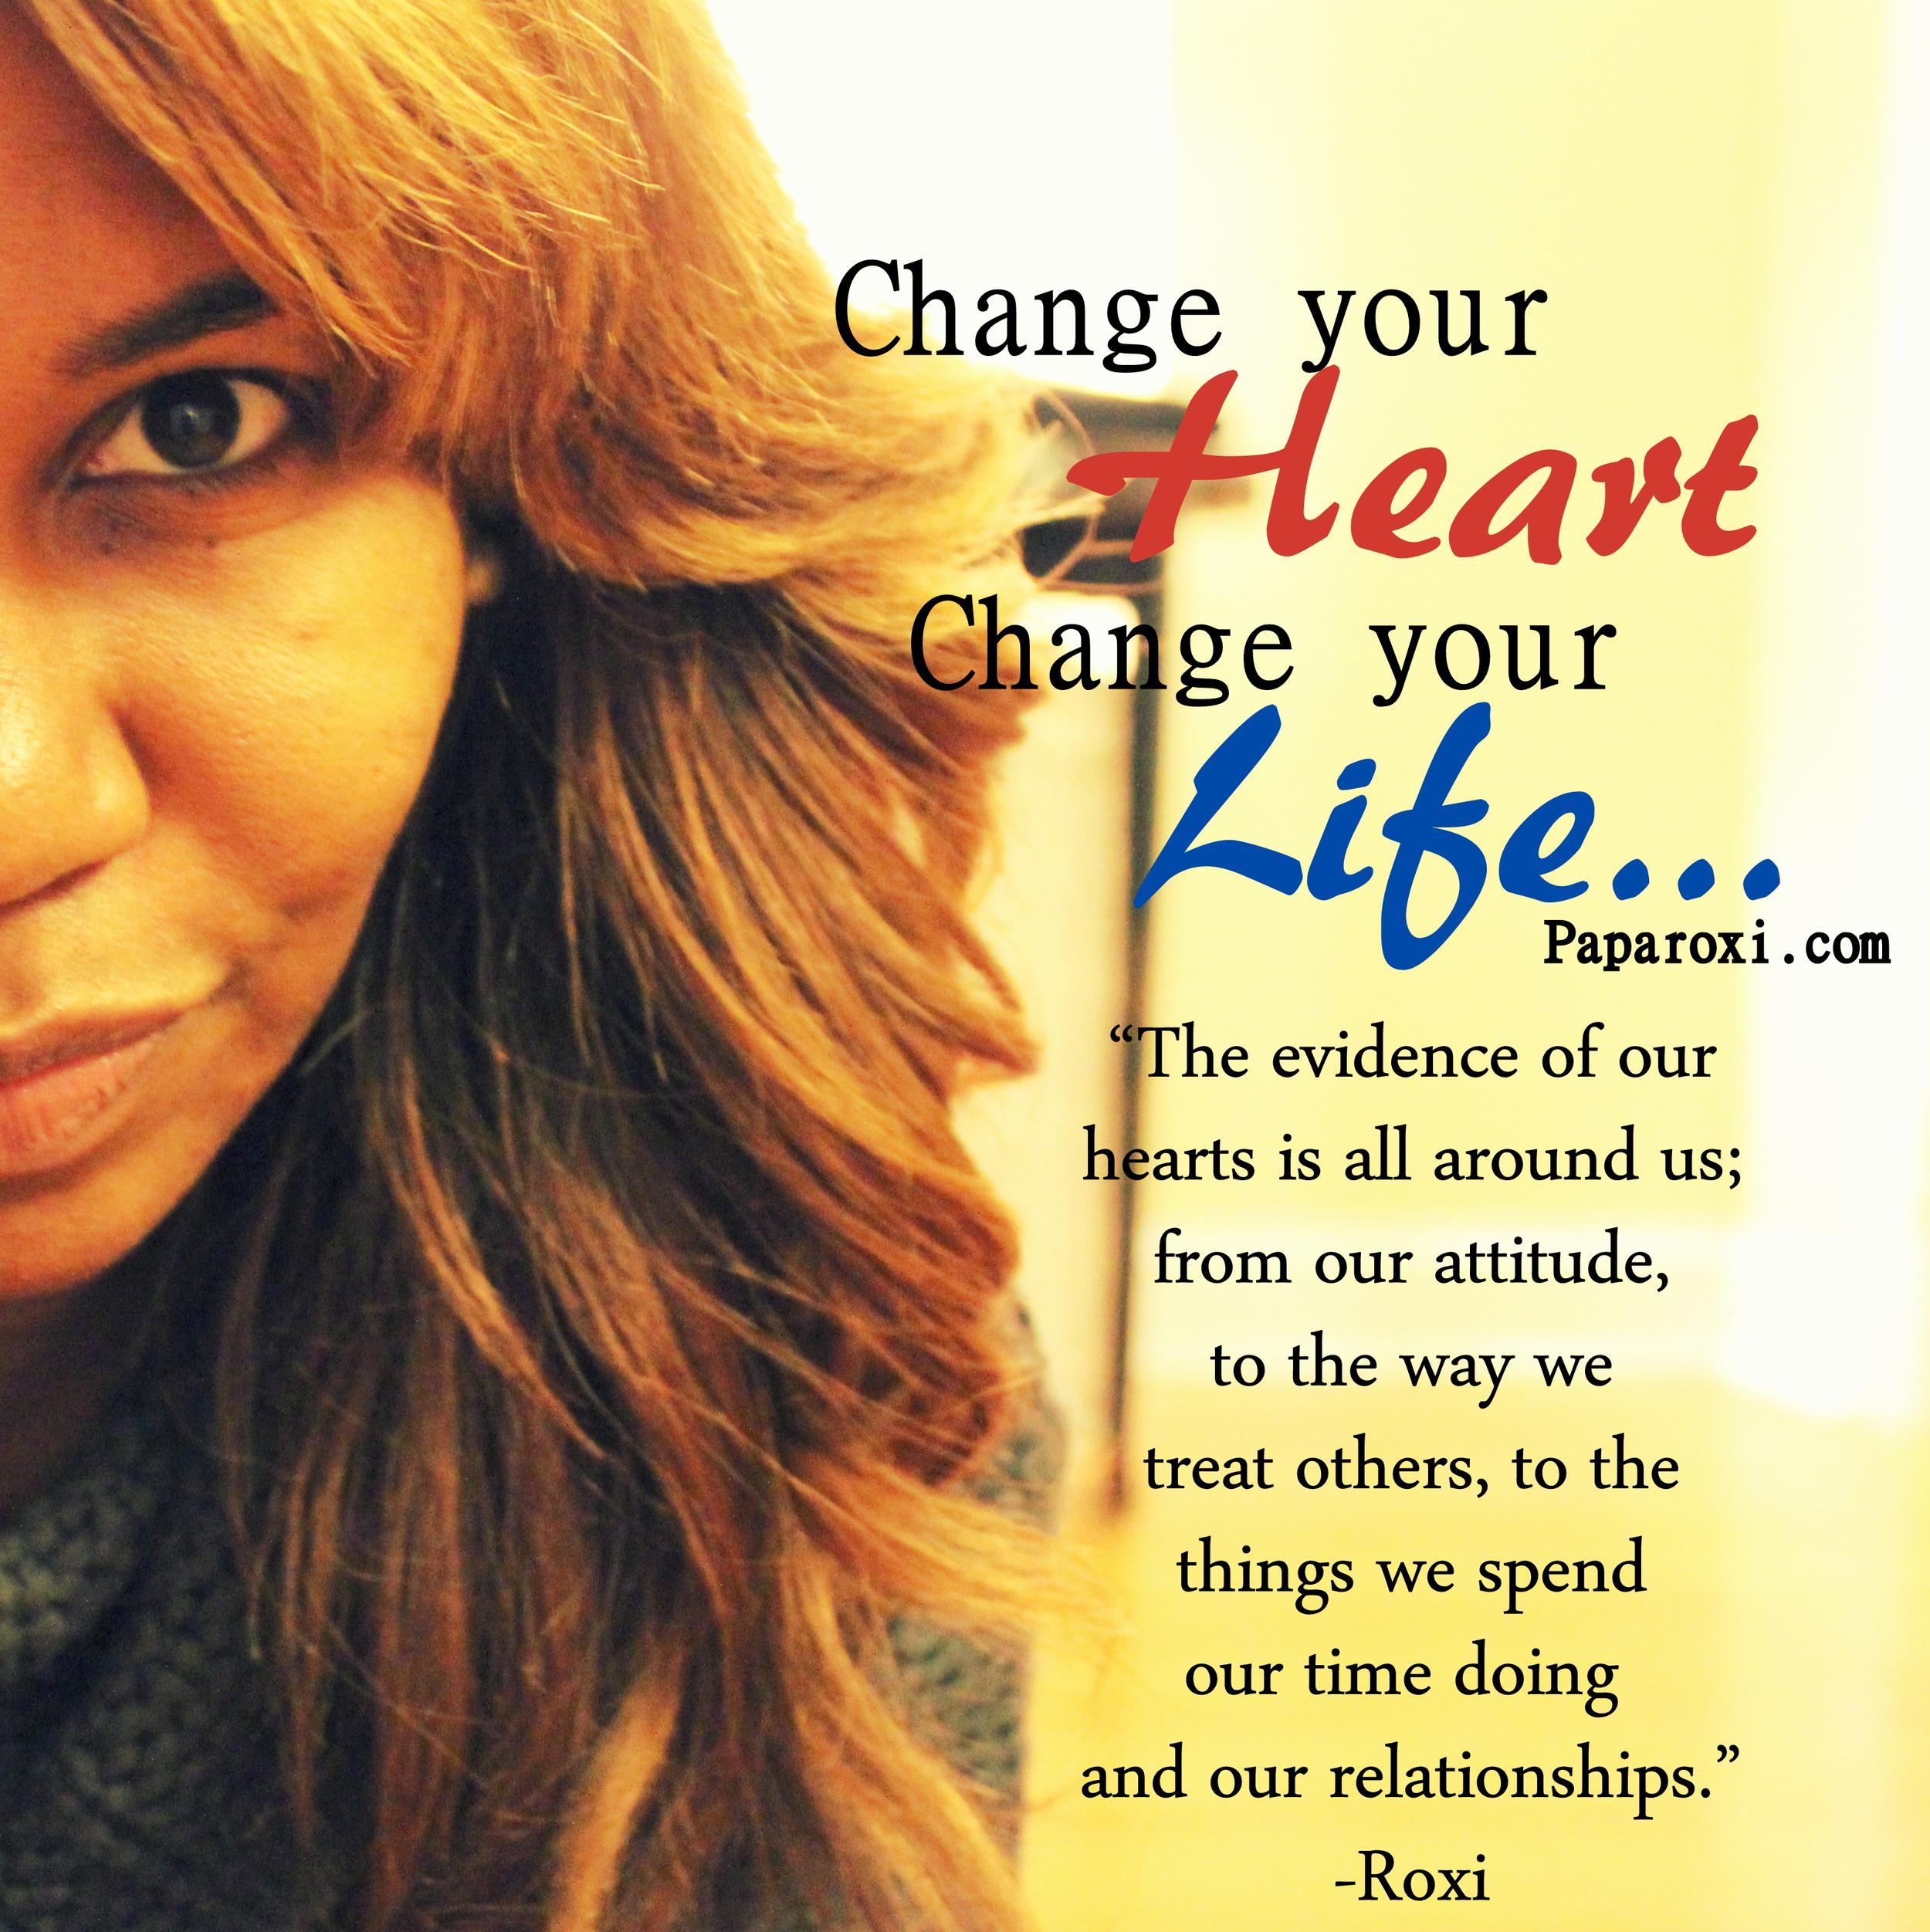 Change your heart.jpg